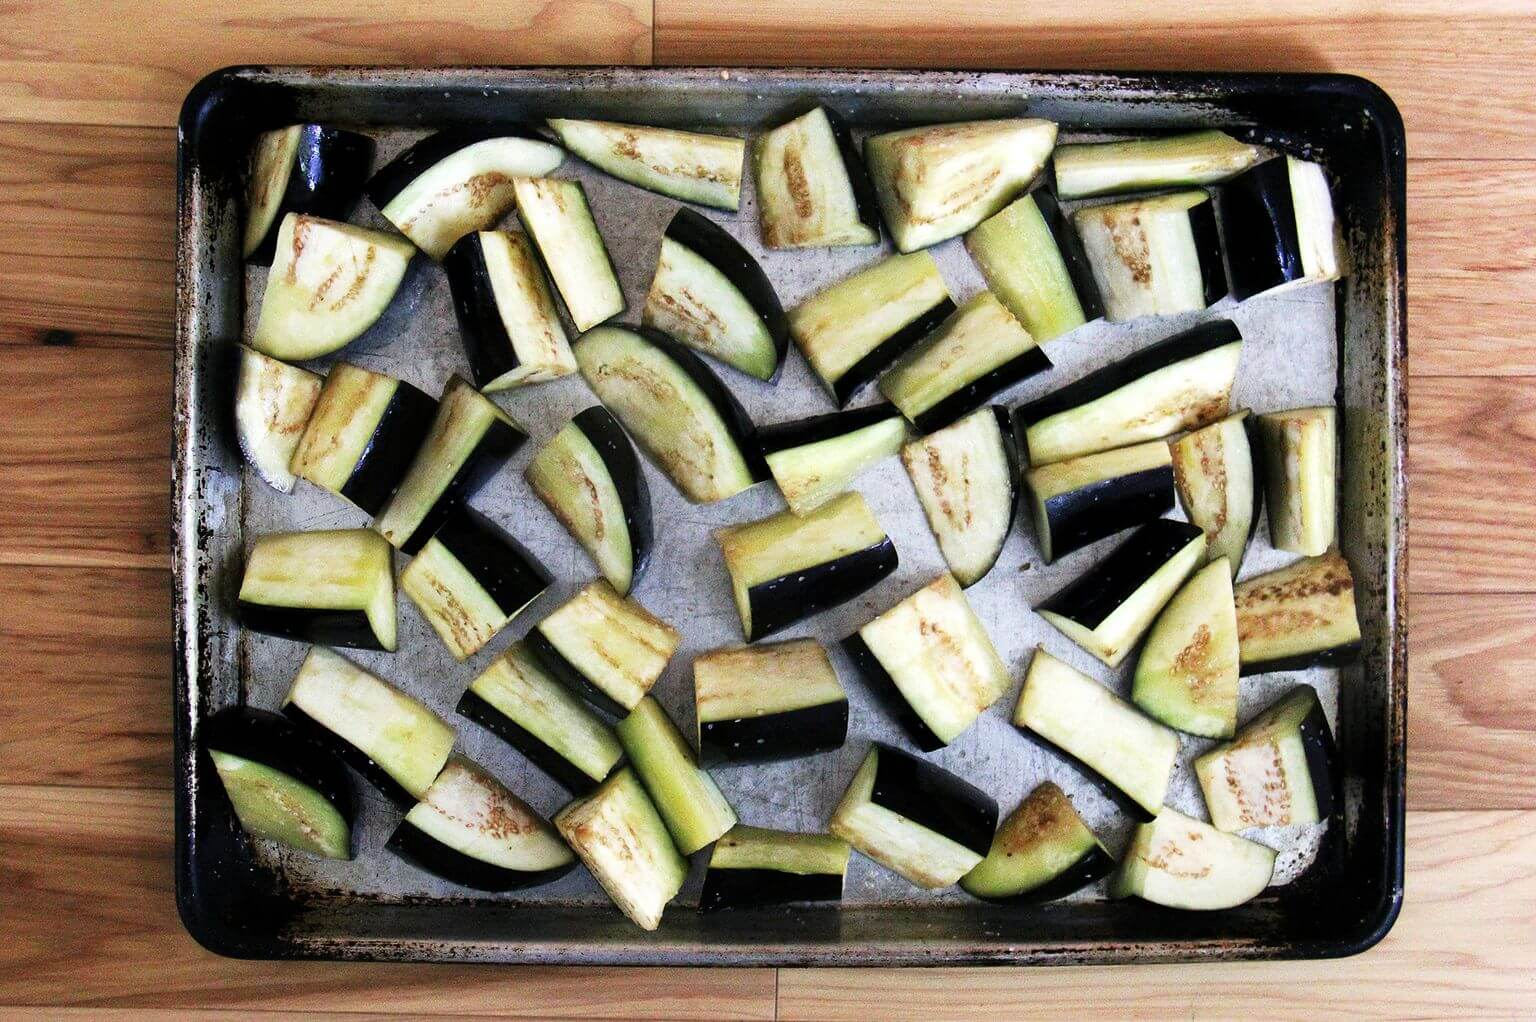 Chopped eggplant on a sheet pan